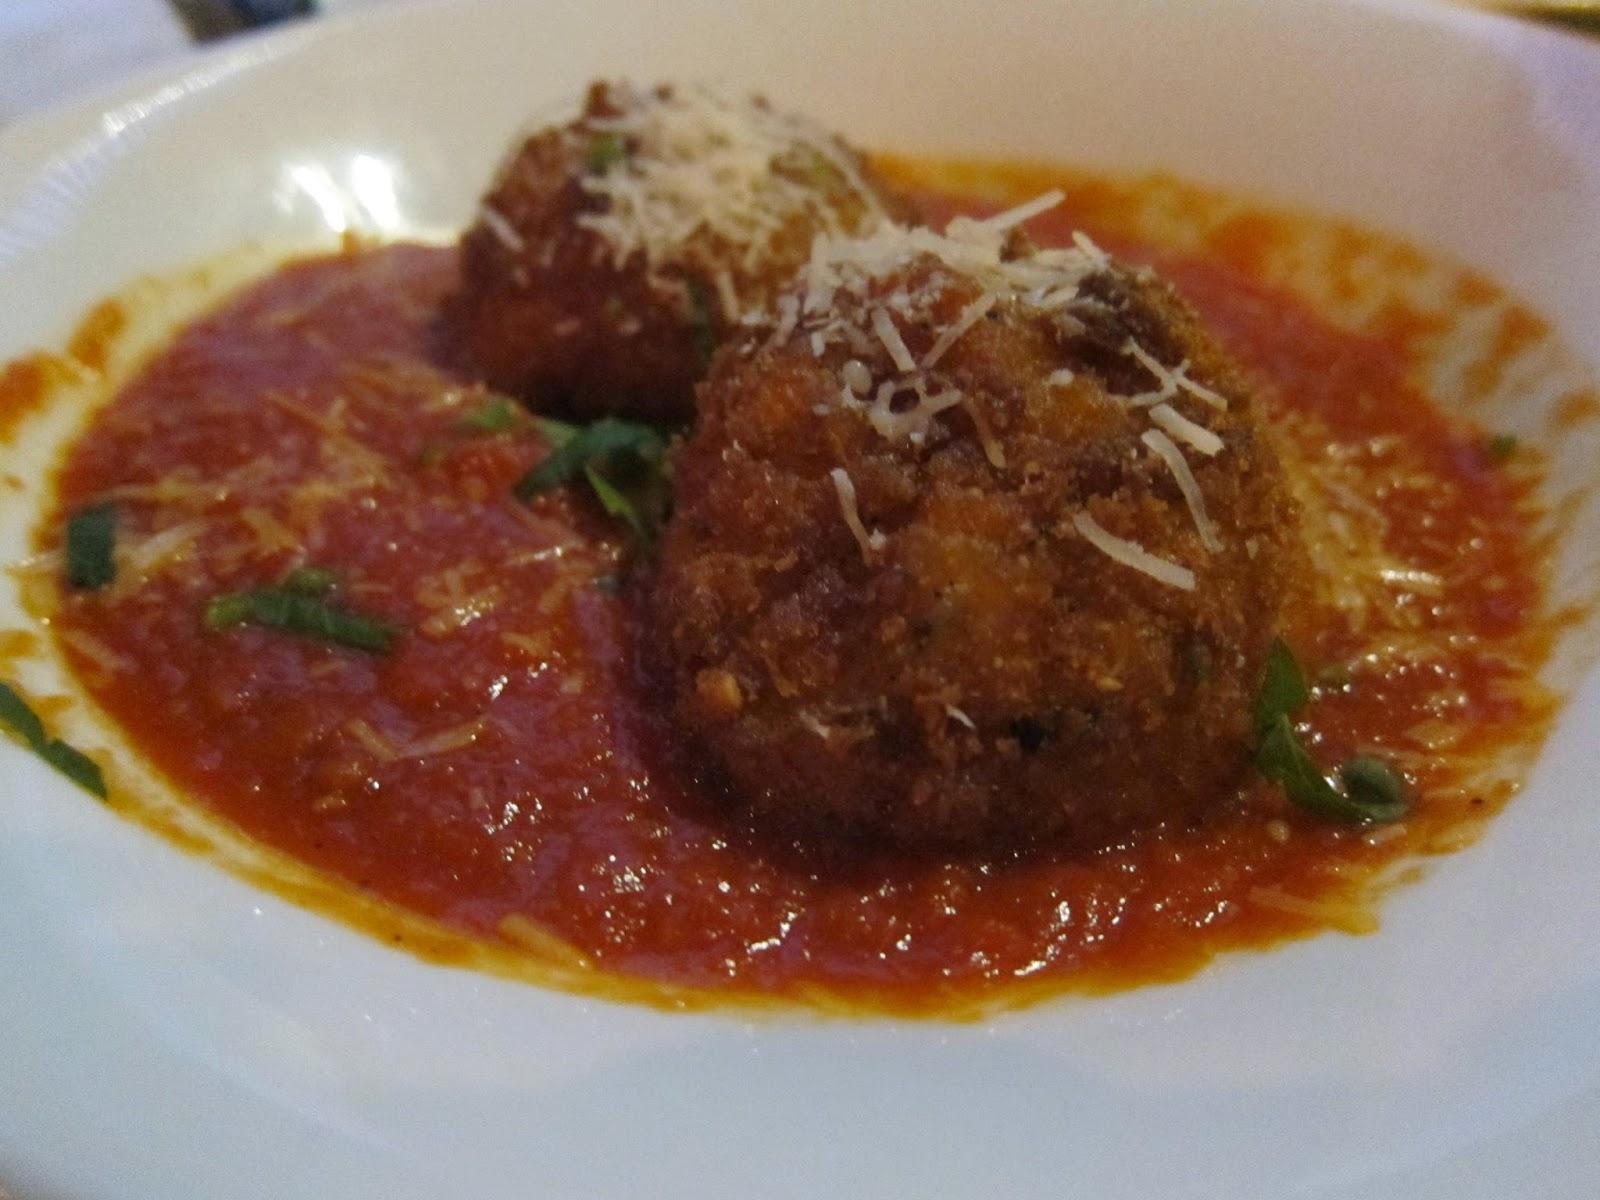 Arancini at Orta | The Economical Eater